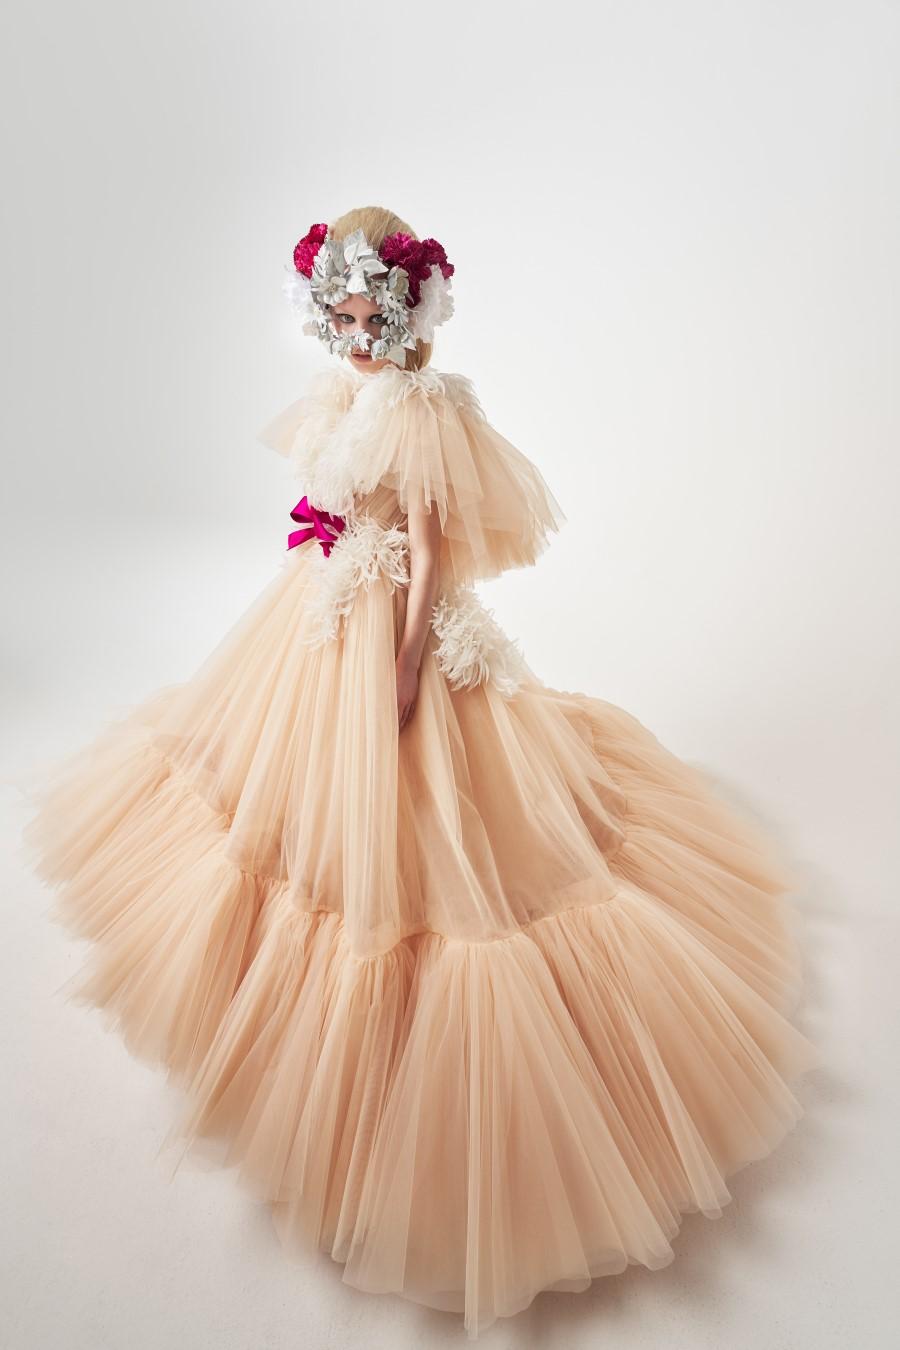 Giambattista Valli Haute Couture Spring Summer 2021